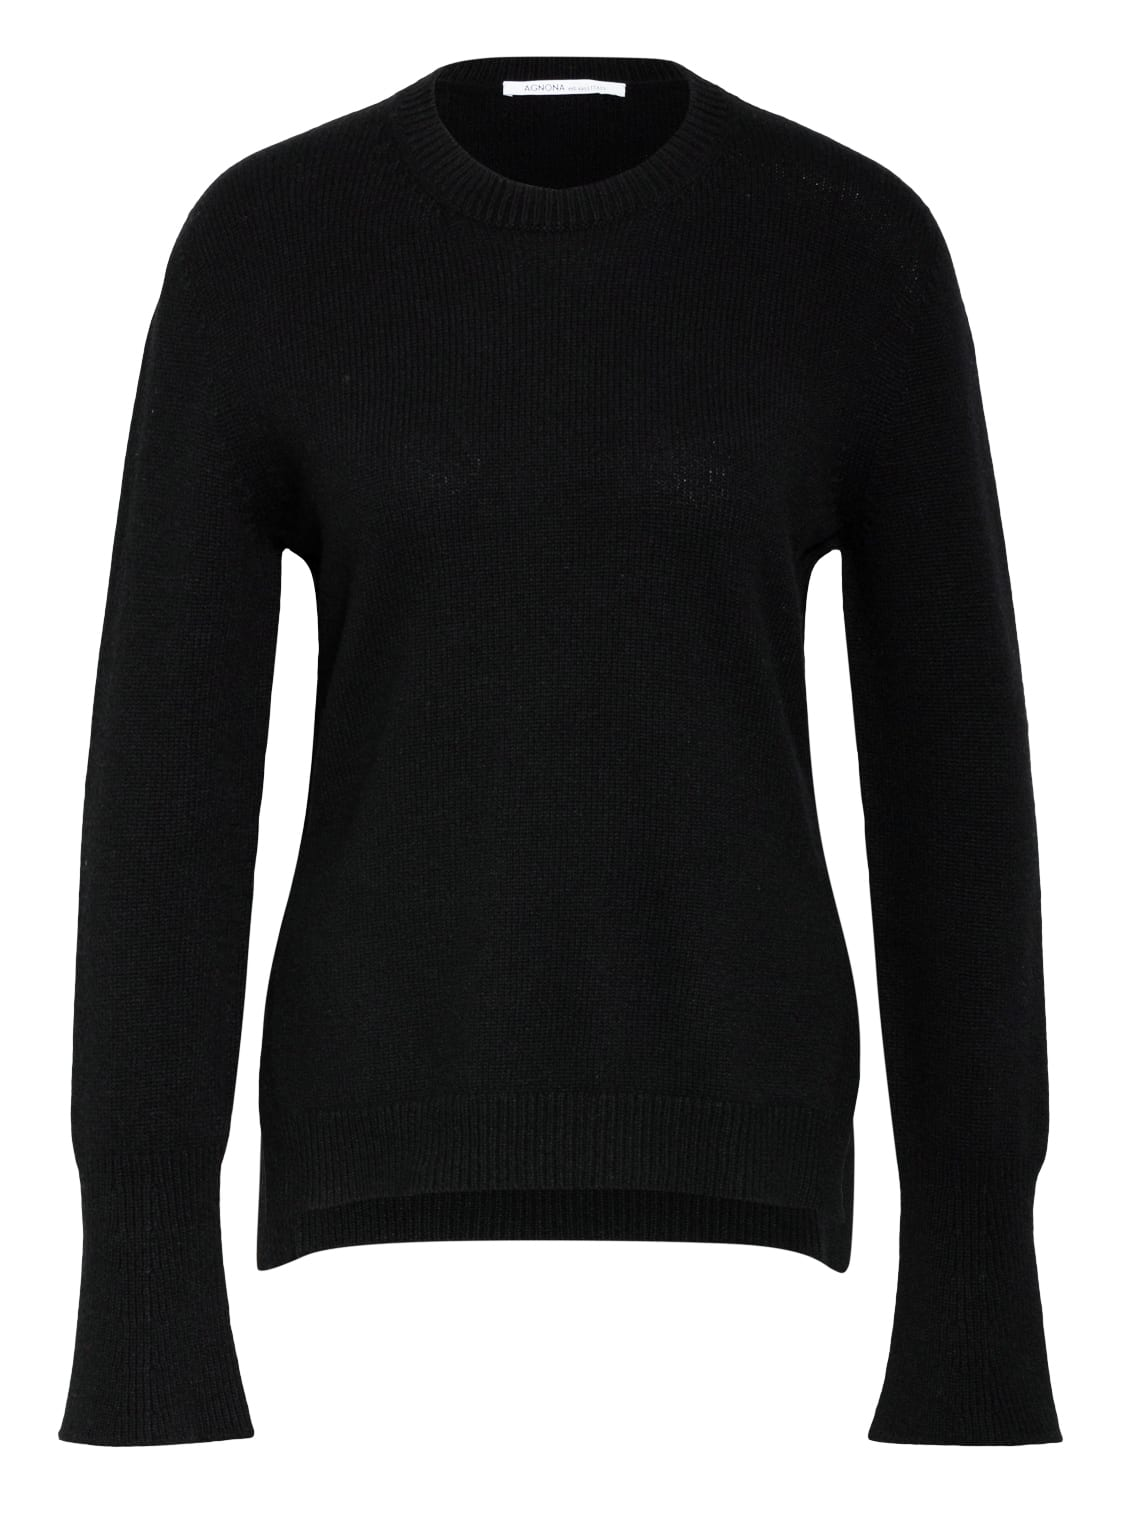 Image of Agnona Cashmere-Pullover schwarz